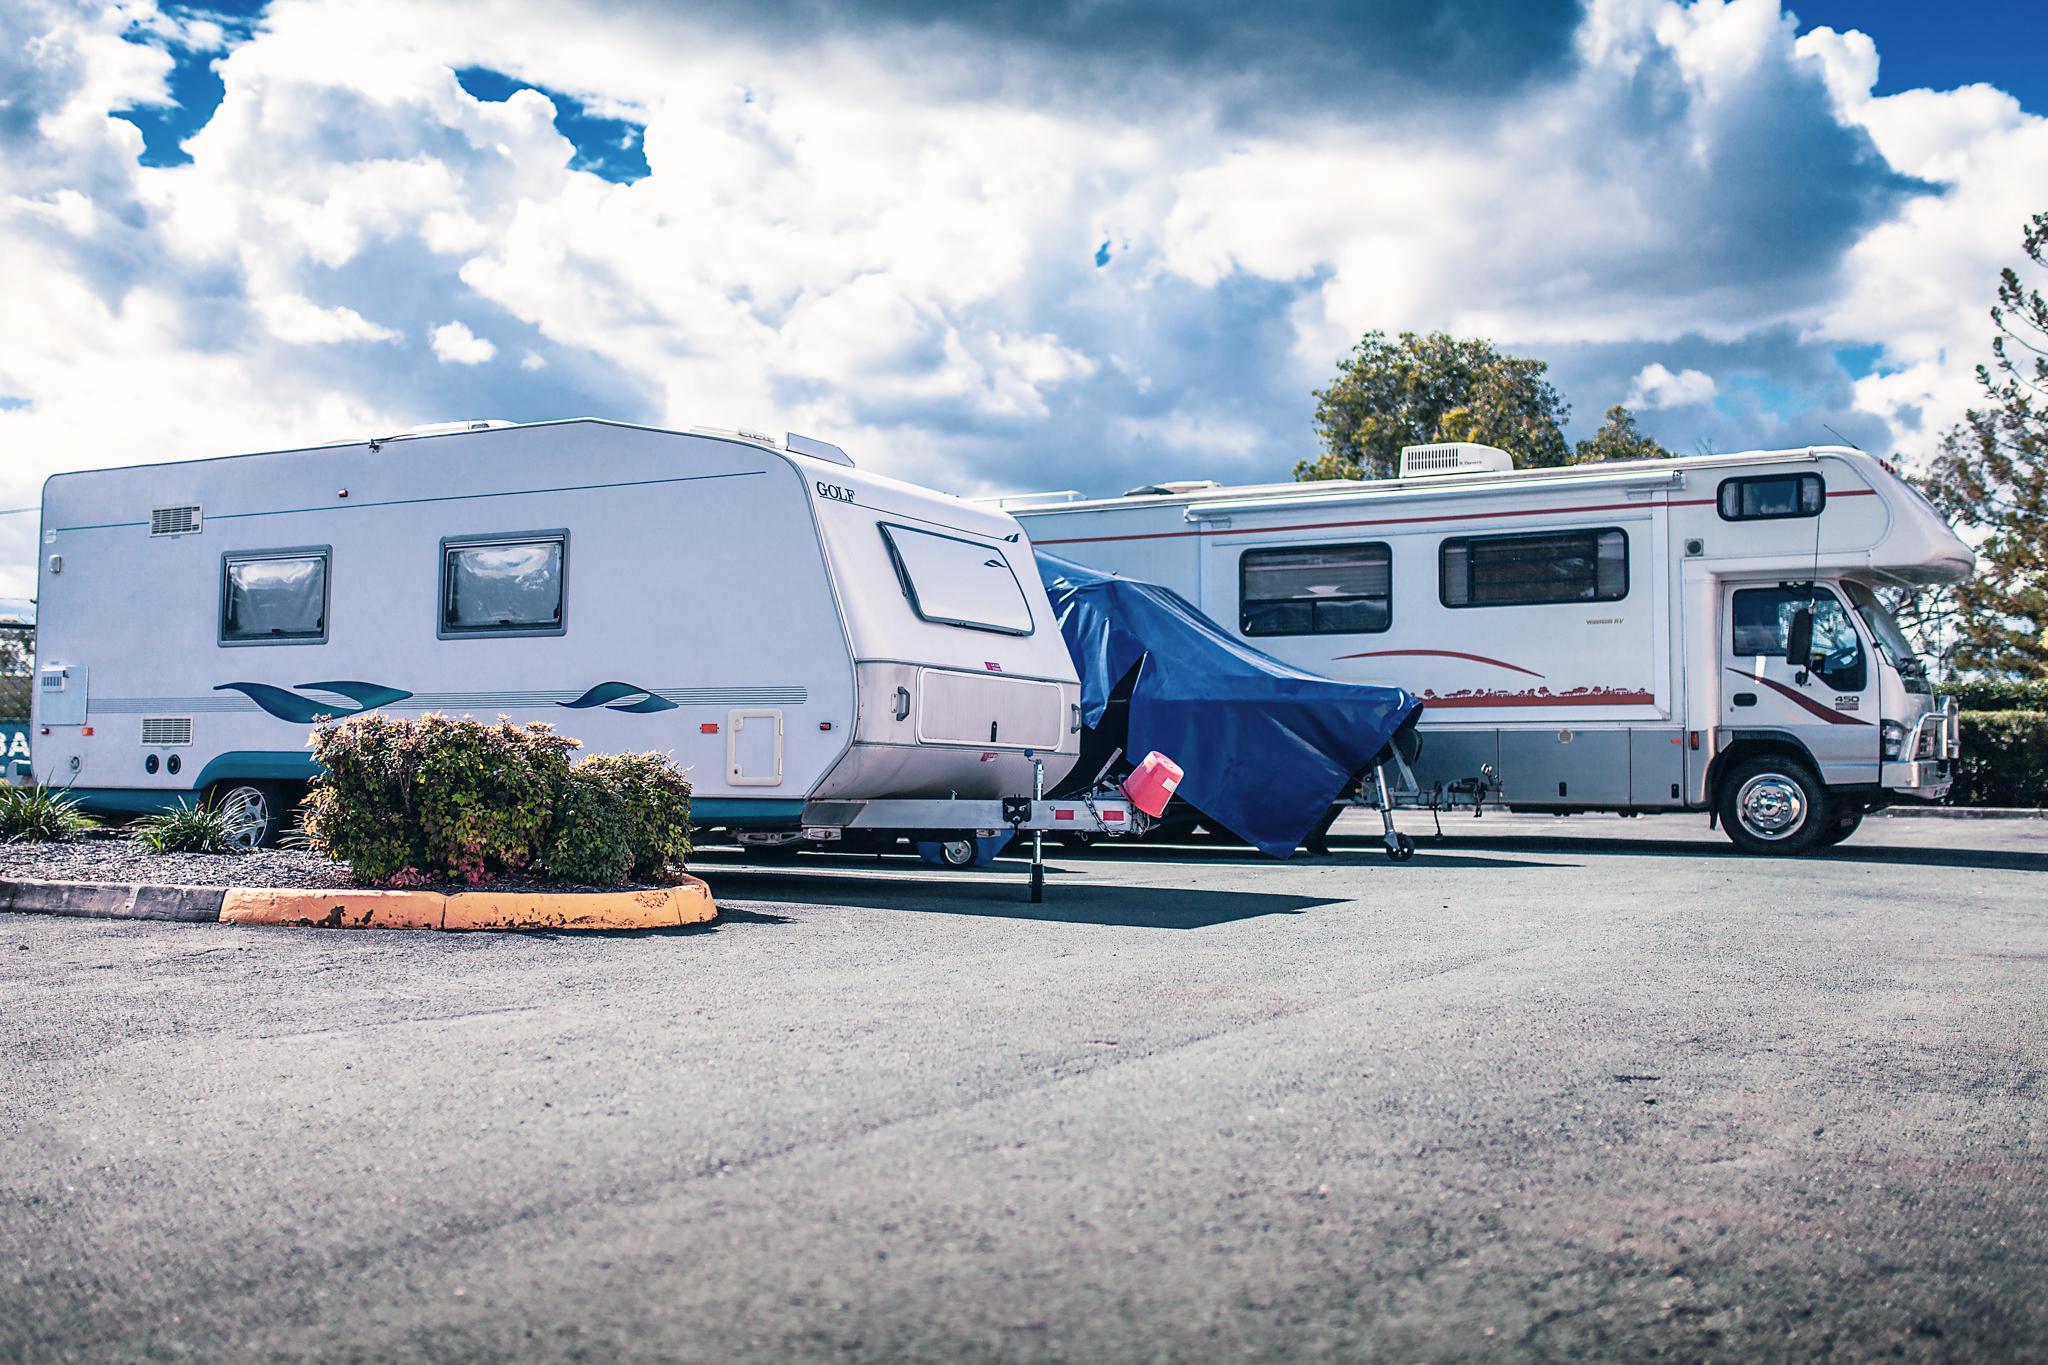 Caravan vehicles parked in an outdoor storage